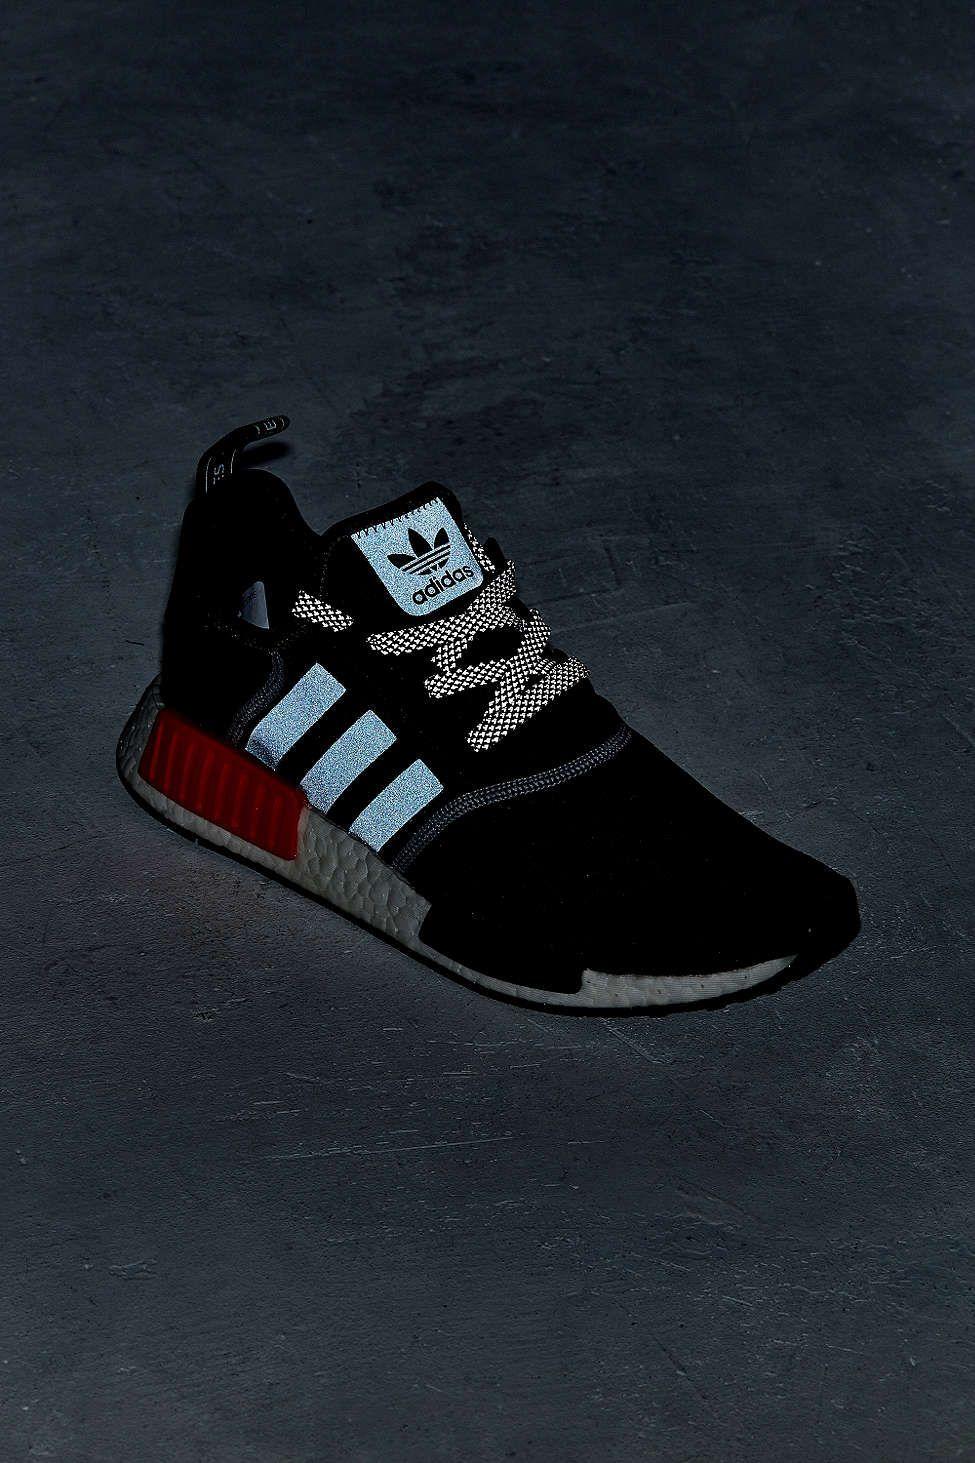 scarpe adidas nmd r1 riflettente urban outfitters uomini